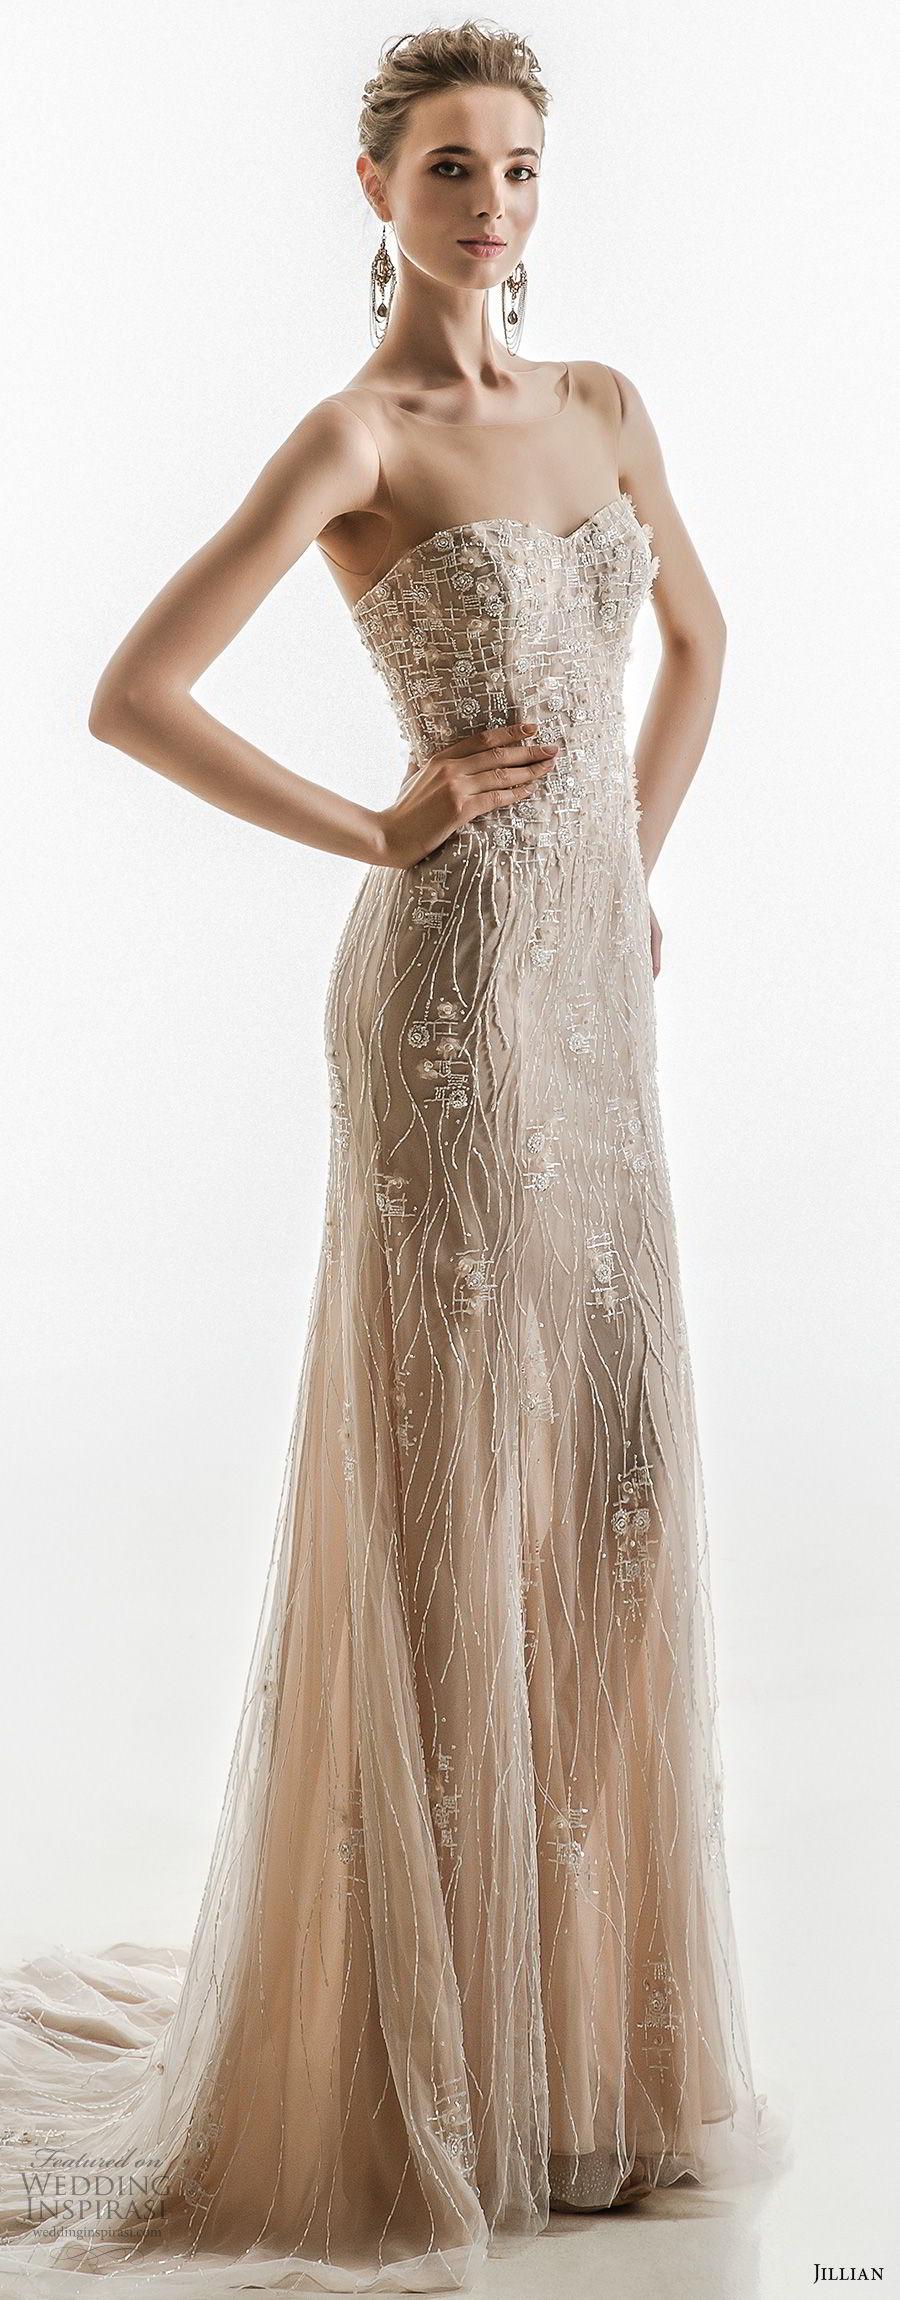 jillian 2018 bridal sleeveless illusion bateau sweetheart neckline full embellishment champagne color elegant sheath wedding dress sweep train (27) mv